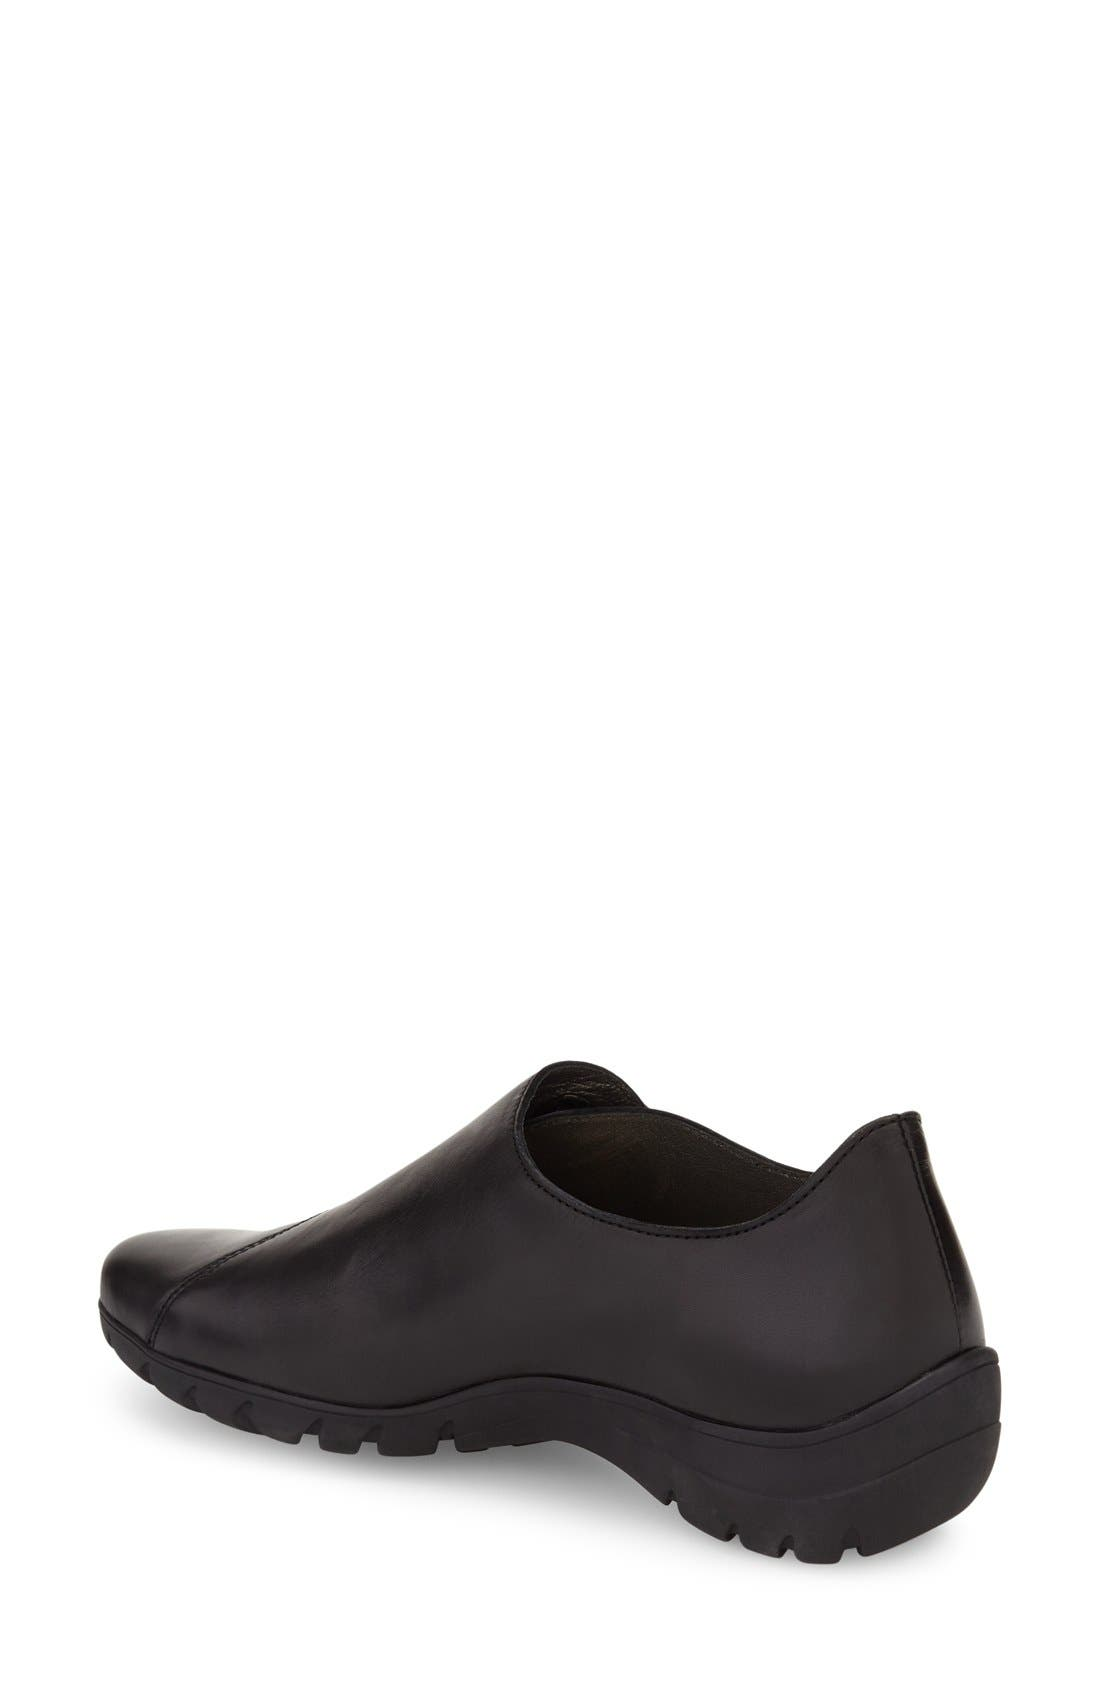 'Luce' Sneaker,                             Alternate thumbnail 2, color,                             Black Silk Leather